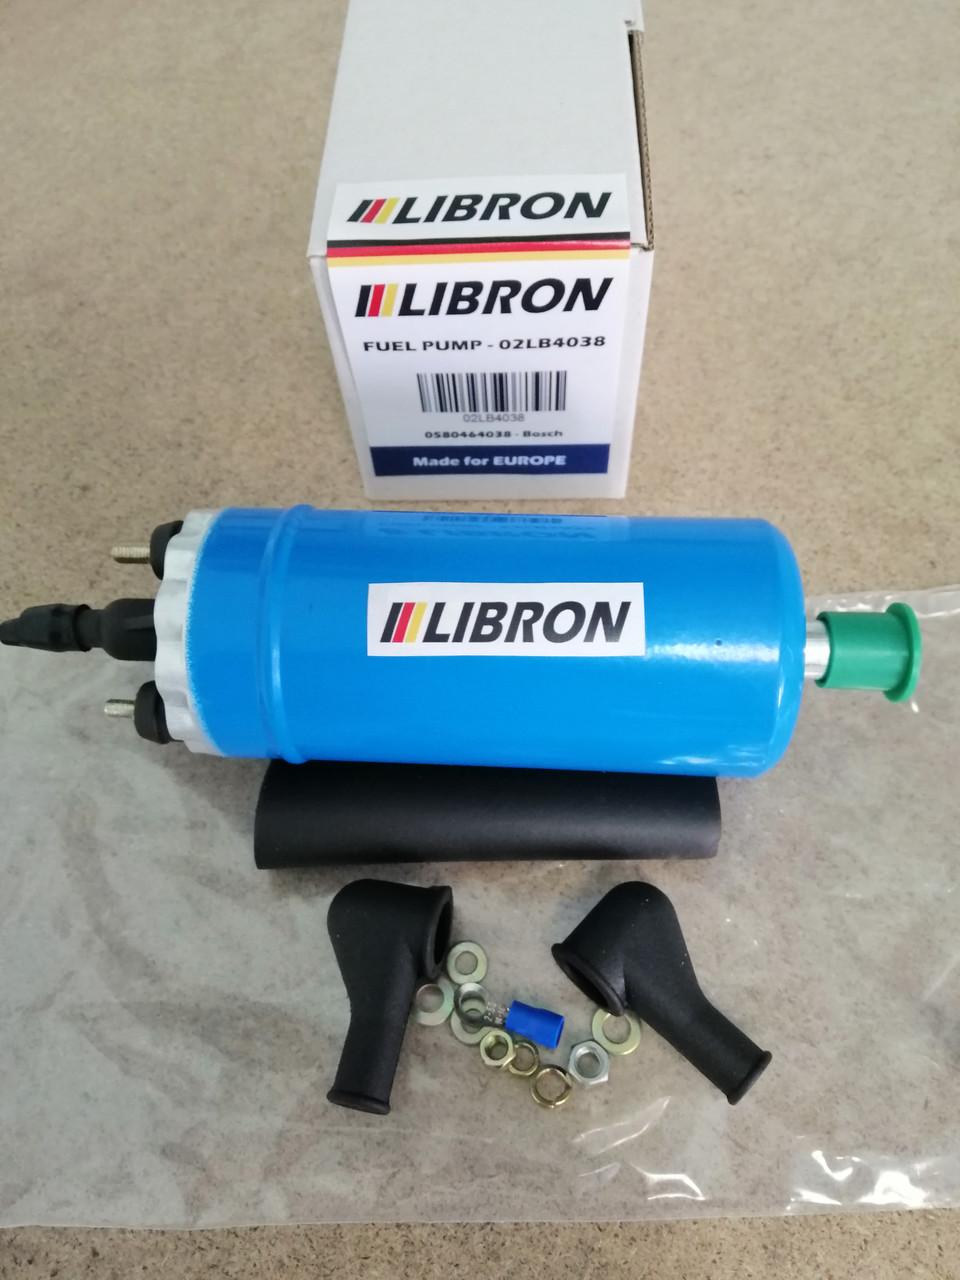 Топливный насос LIBRON 02LB4038 - BMW 5 (E12) 528 i (1977-1981)